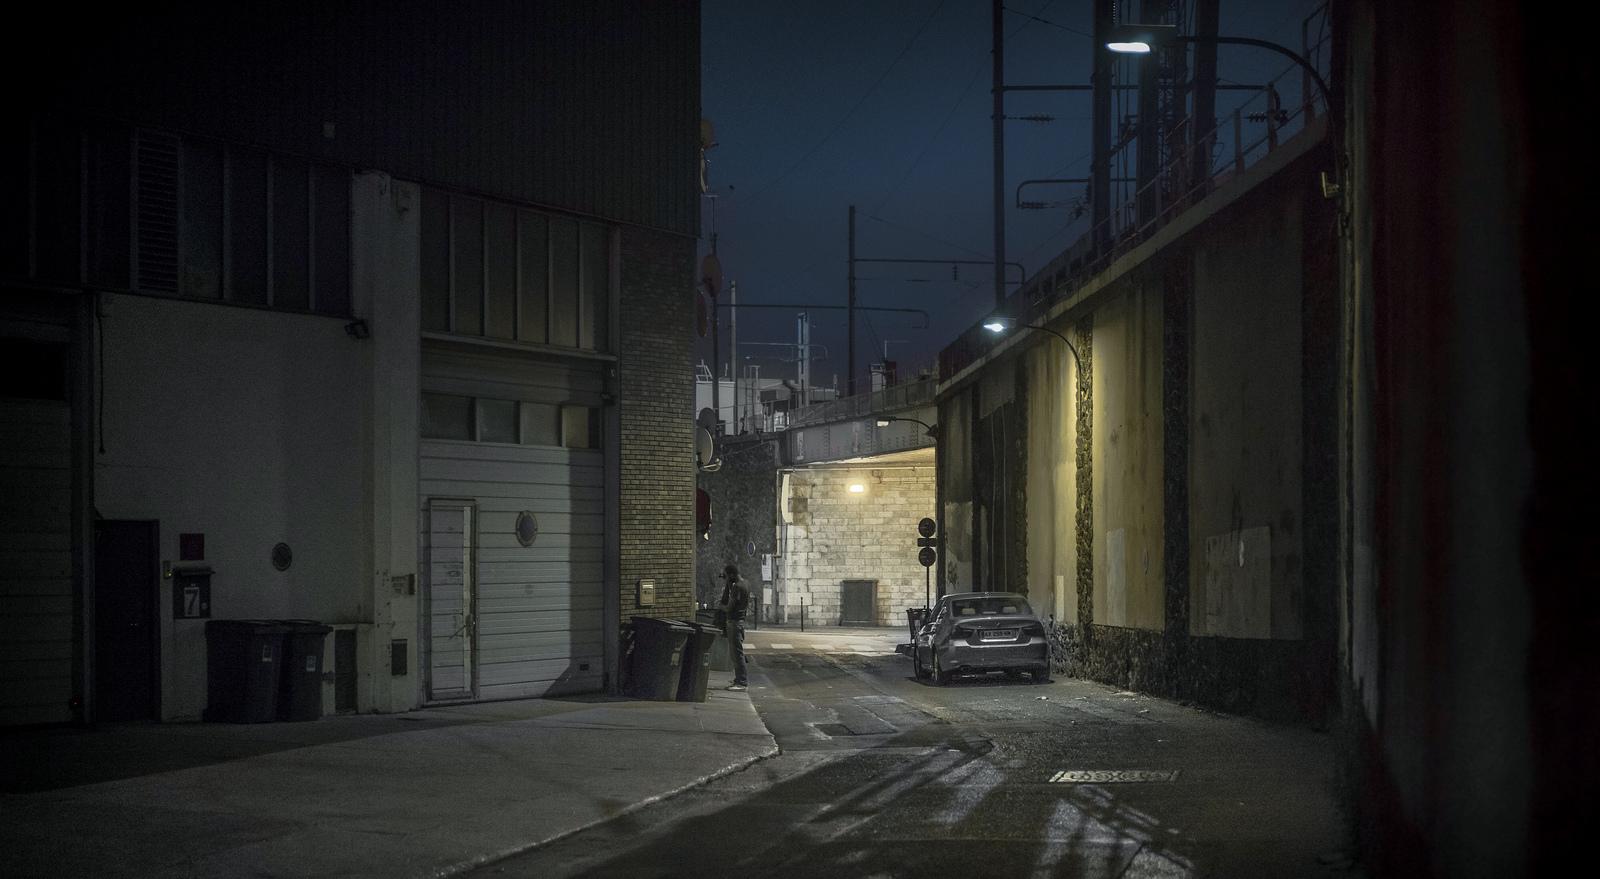 stills-from-hidden-stories-08